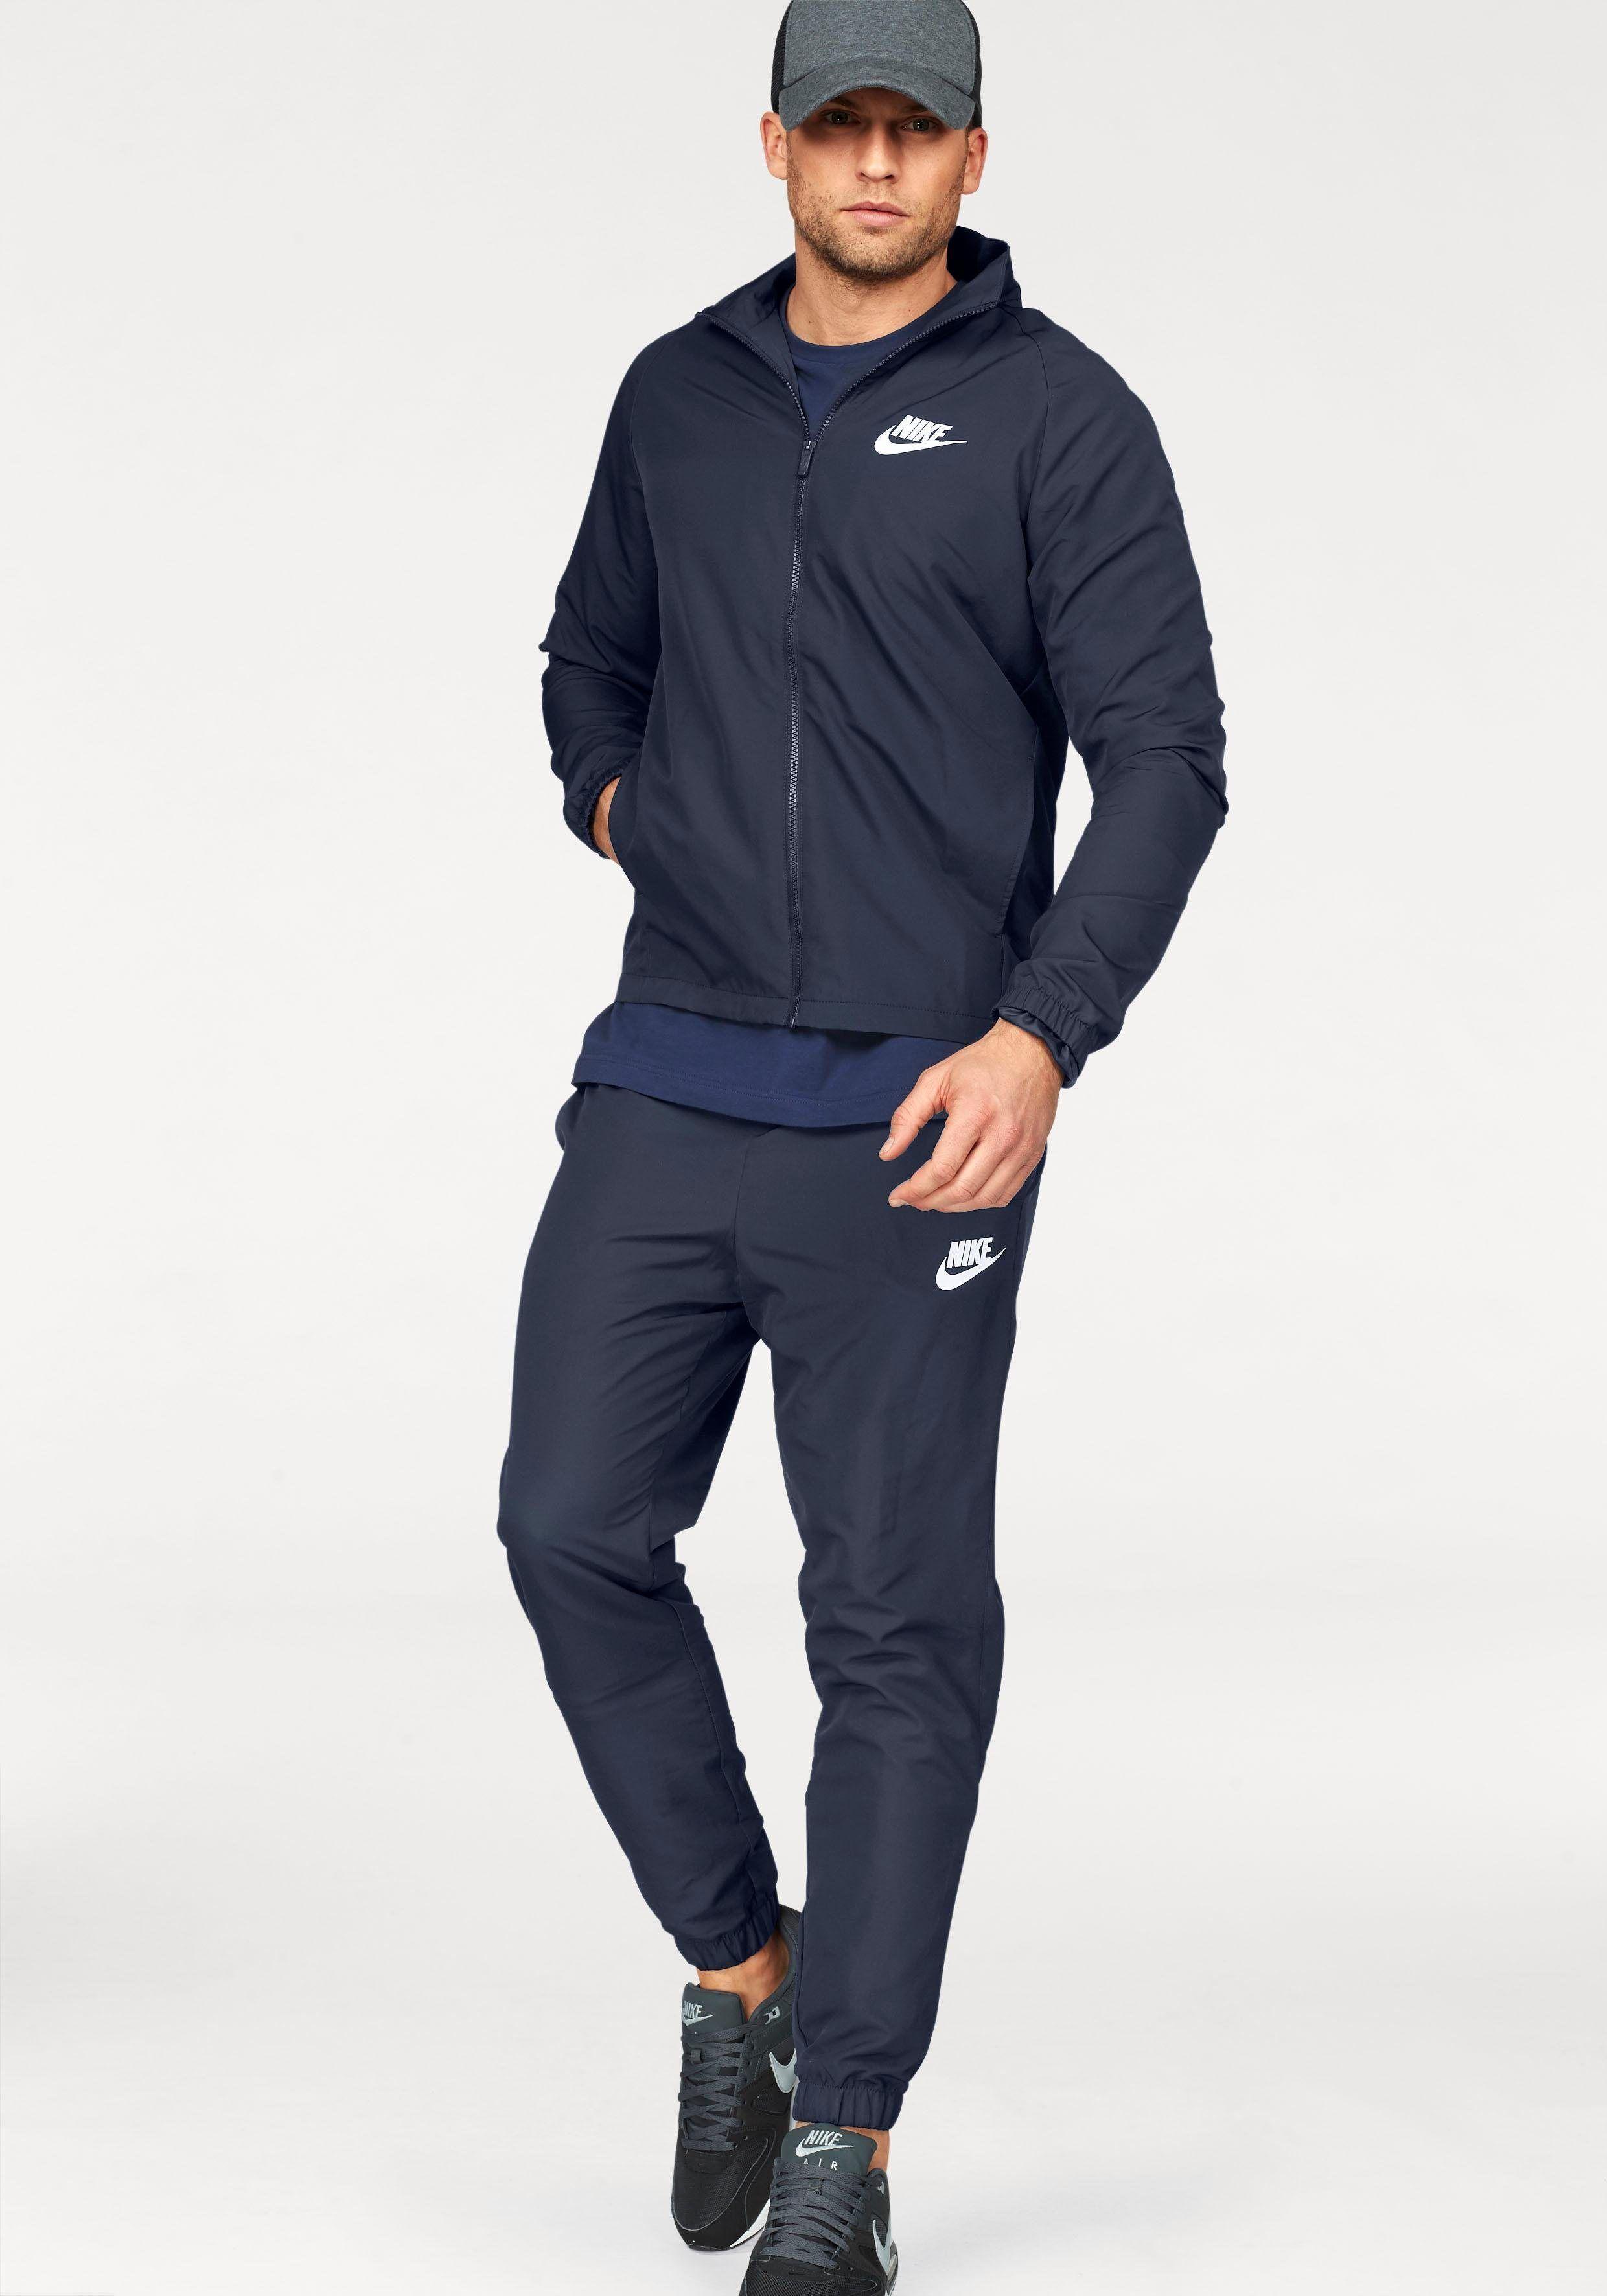 new style 52555 7fa25 Herren #Nike #Sportswear #Trainingsanzug #TRACK #SUIT #WOVEN #BASIC ...